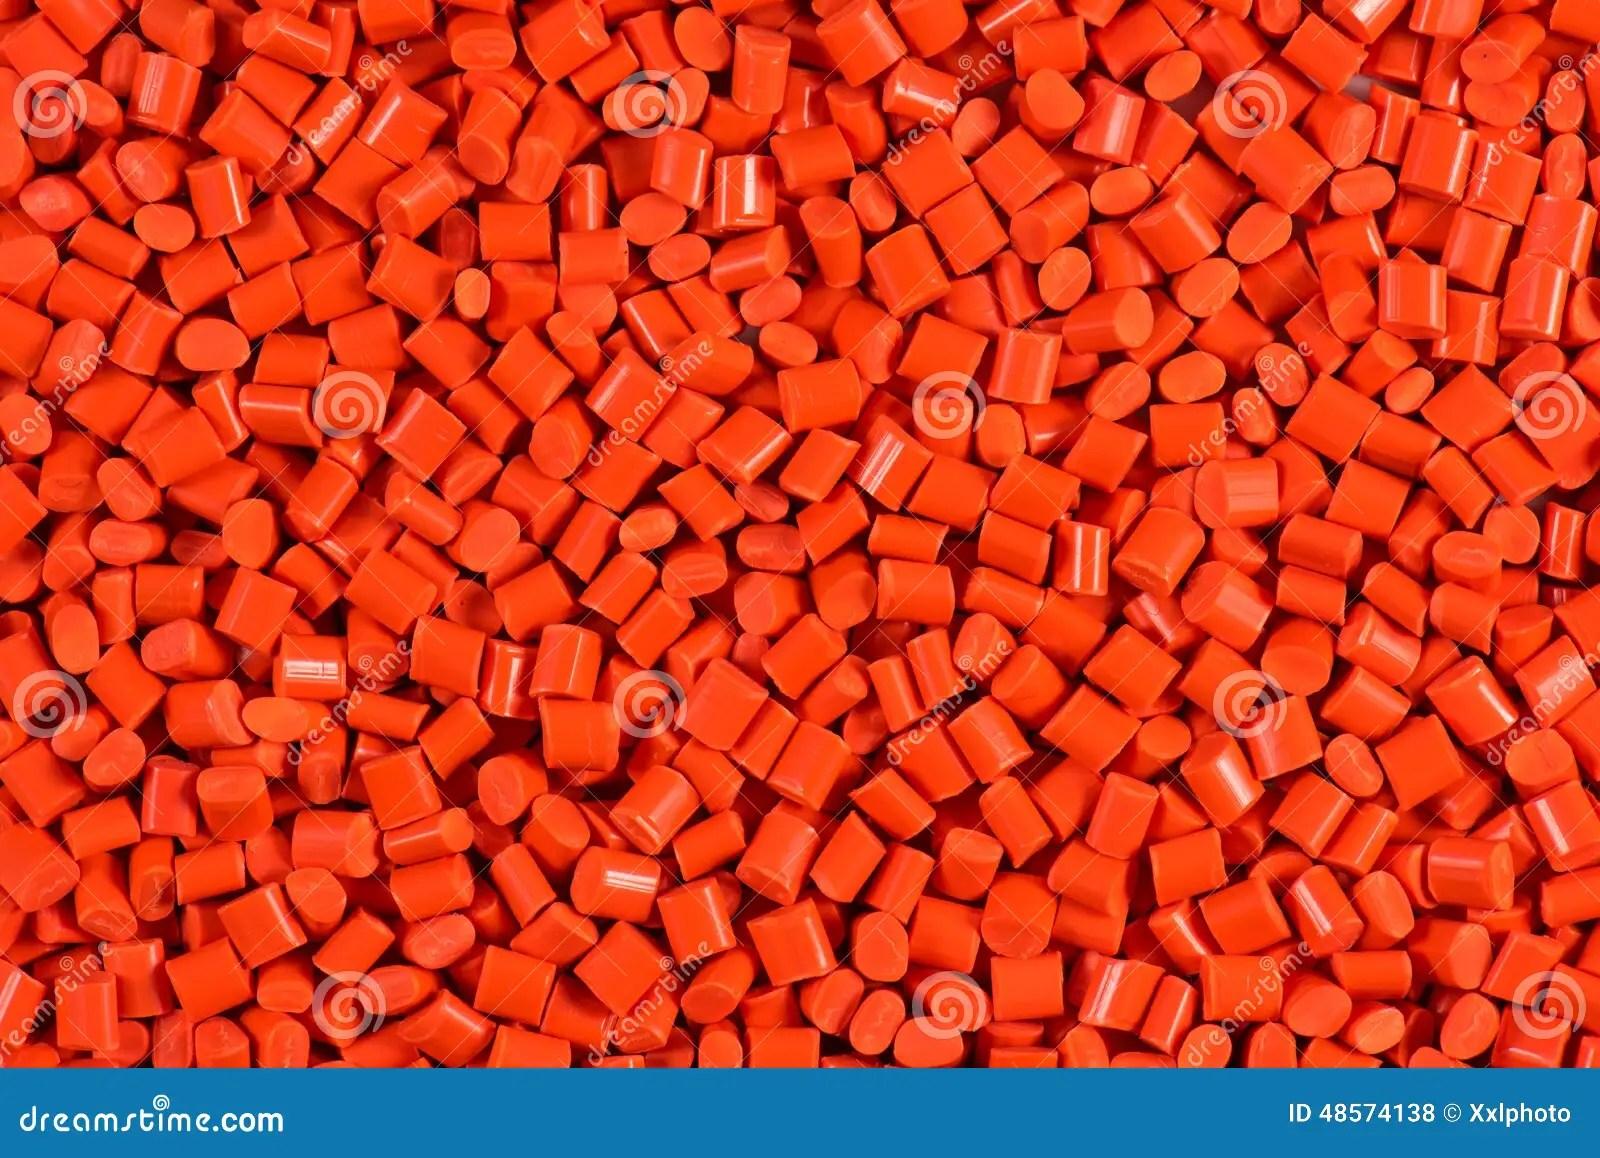 Red Plastic Granulate Pellets Stock Photo Image 48574138